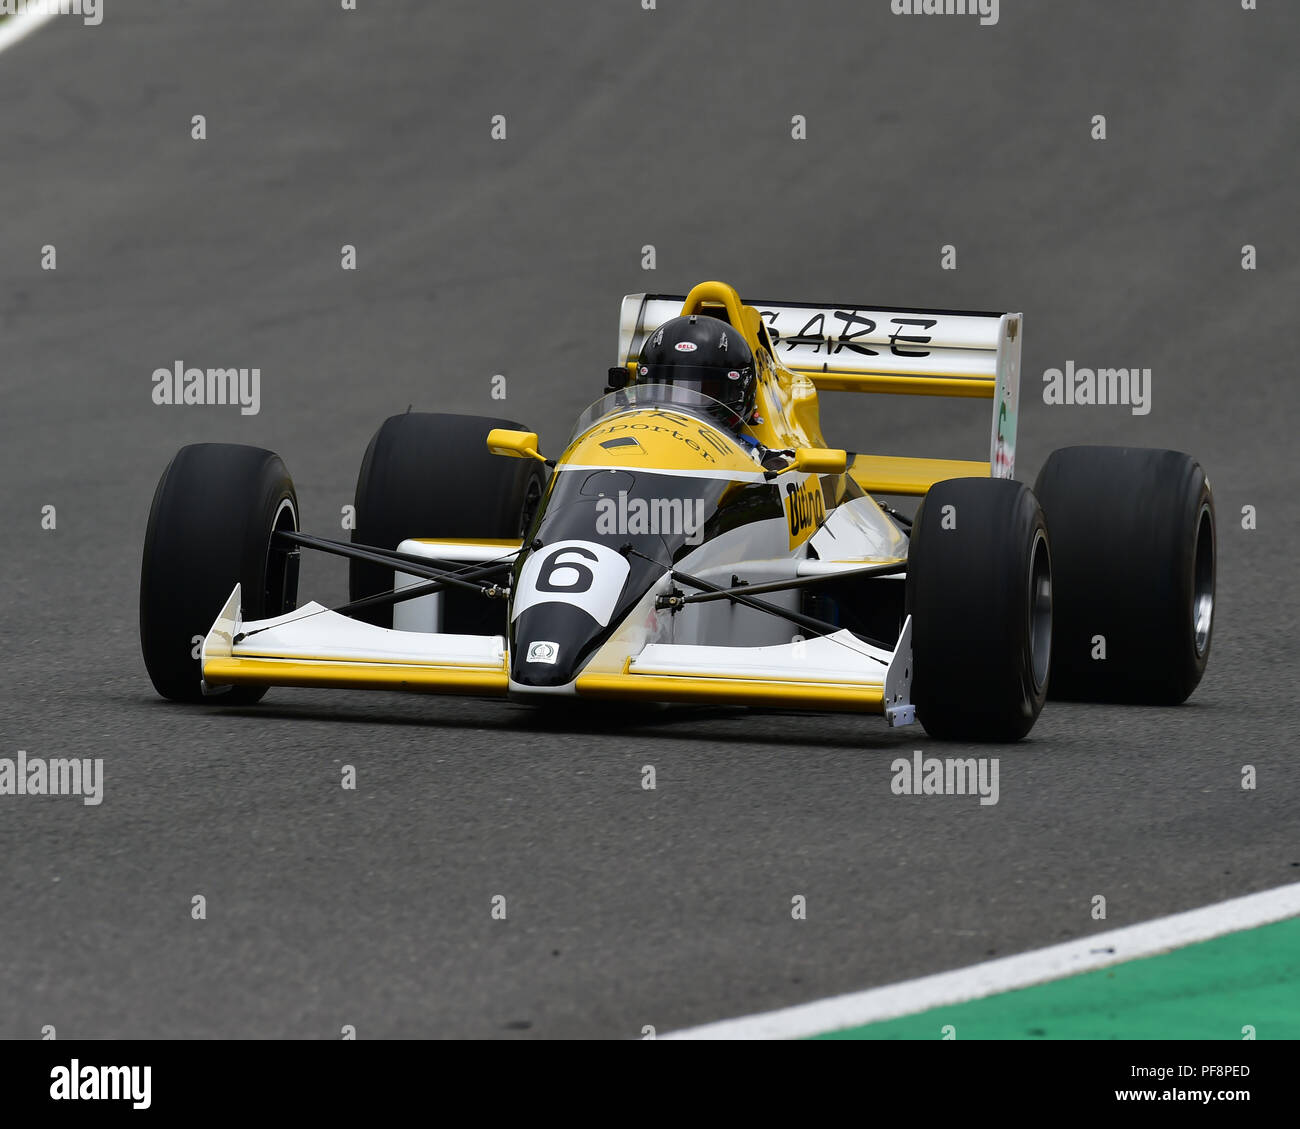 F3000 Reynard, F1, Historic Racing Car Demonstration, Festival Italia, Brands Hatch, Kent, August 19th, 2018, circuit racing, competition, Ferrari, Fe - Stock Image